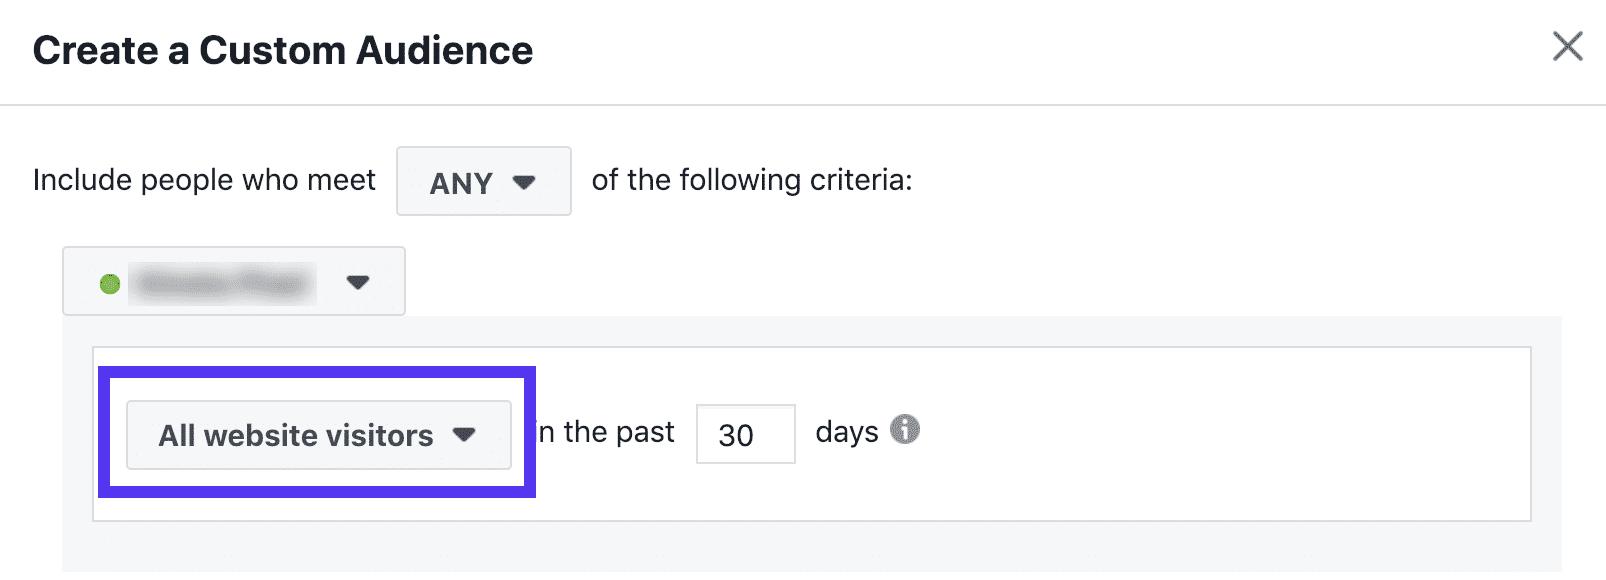 Audience de reciblage Facebook - 30 derniers jours